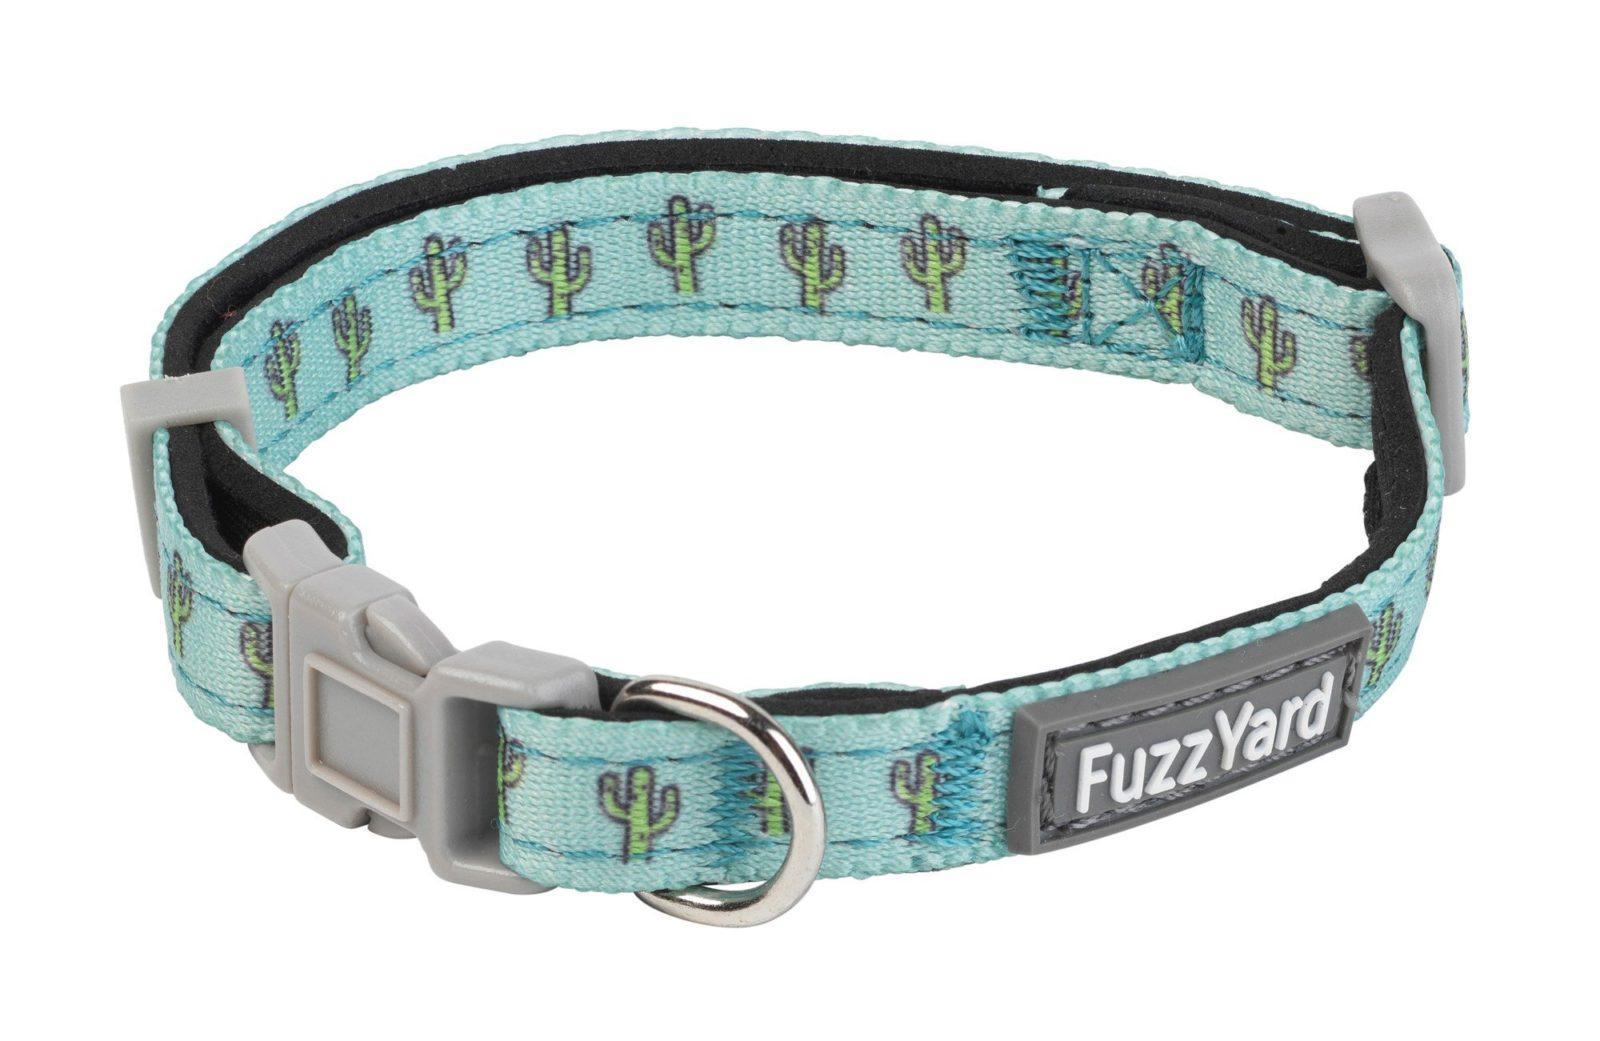 Fuzzyard Neoprene Adjustable Dog Collar with Lockable Buckle Space Raiders